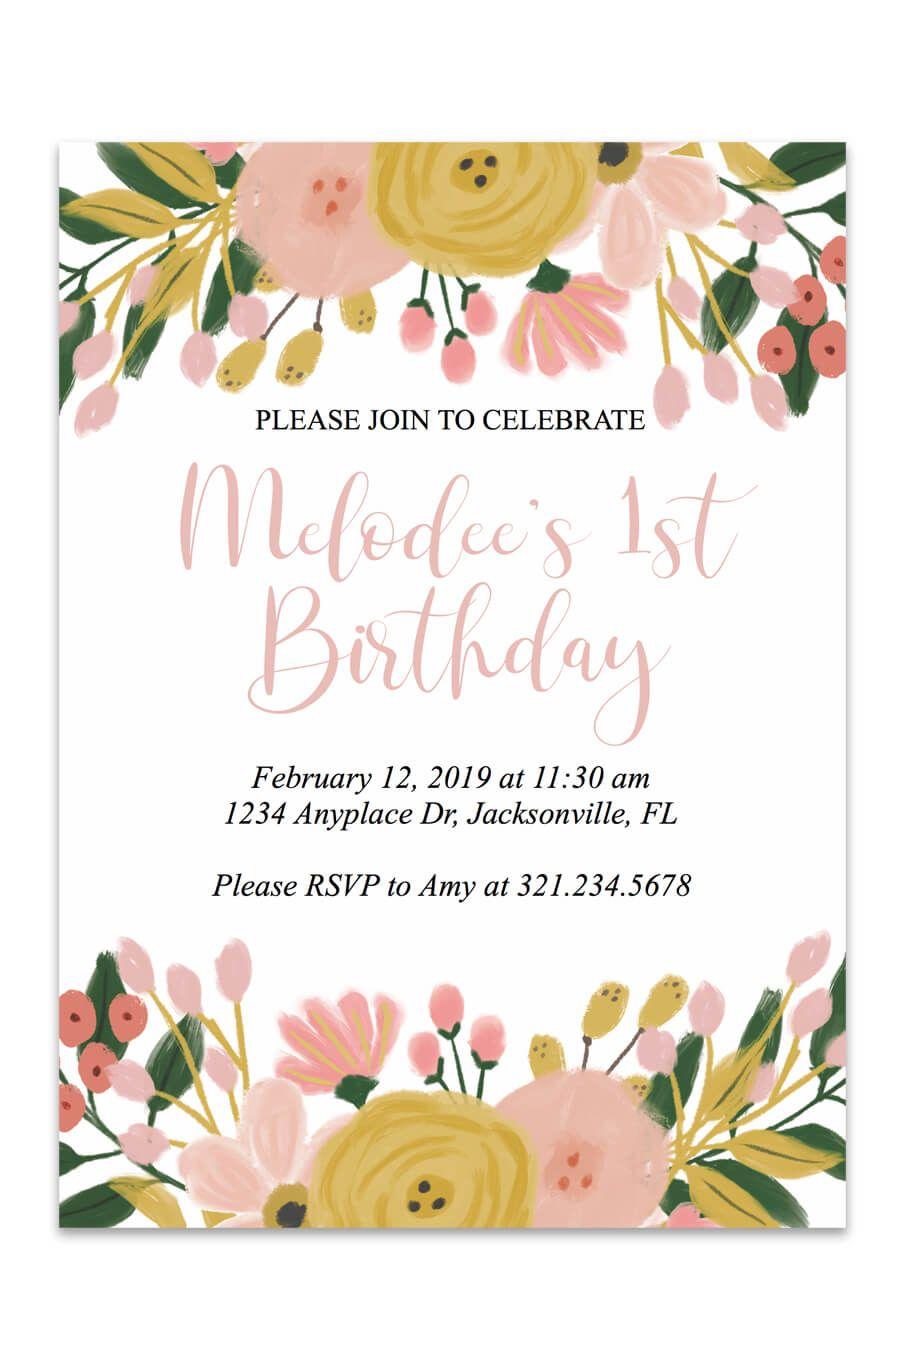 Birthday Printable Invitation (Whimsical Botanical) | Printable birthday  invitations, Party invitations printable, Free birthday invitation templates